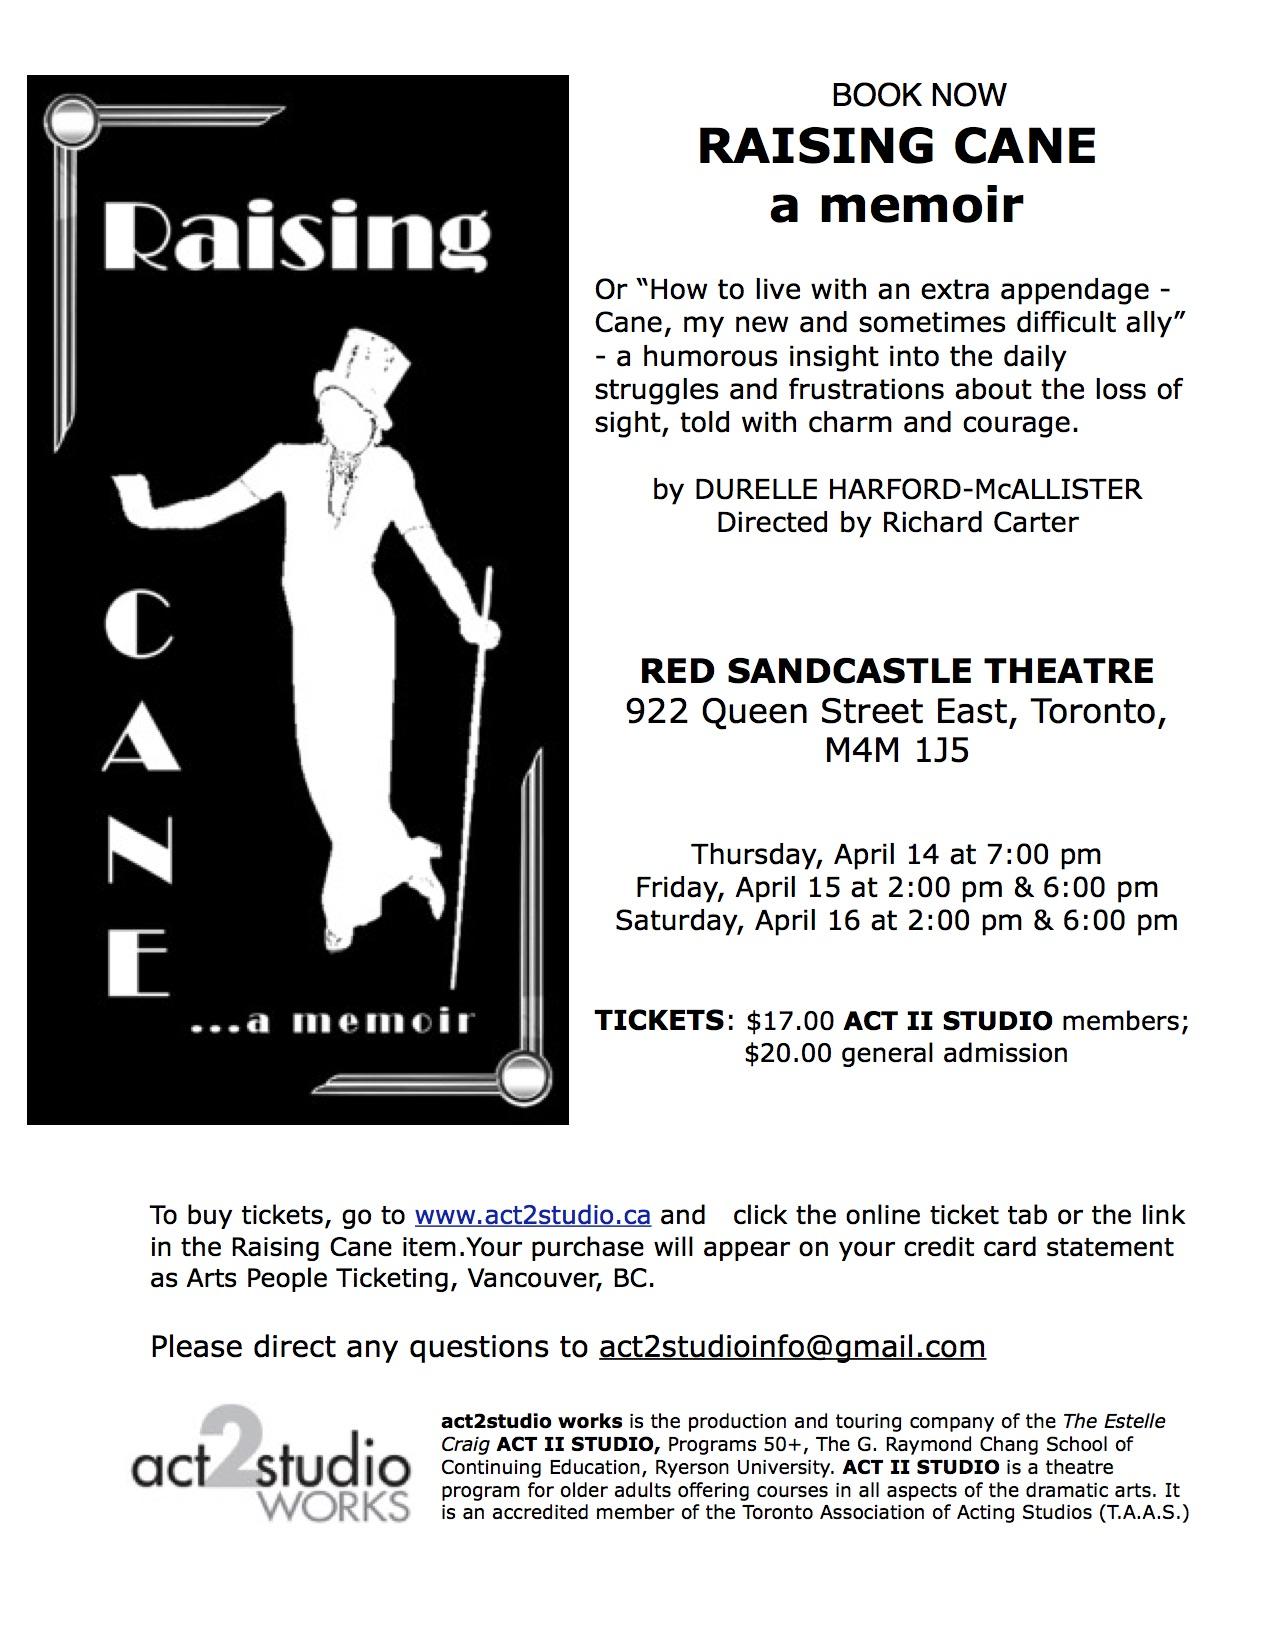 RAISING CANE poster copy